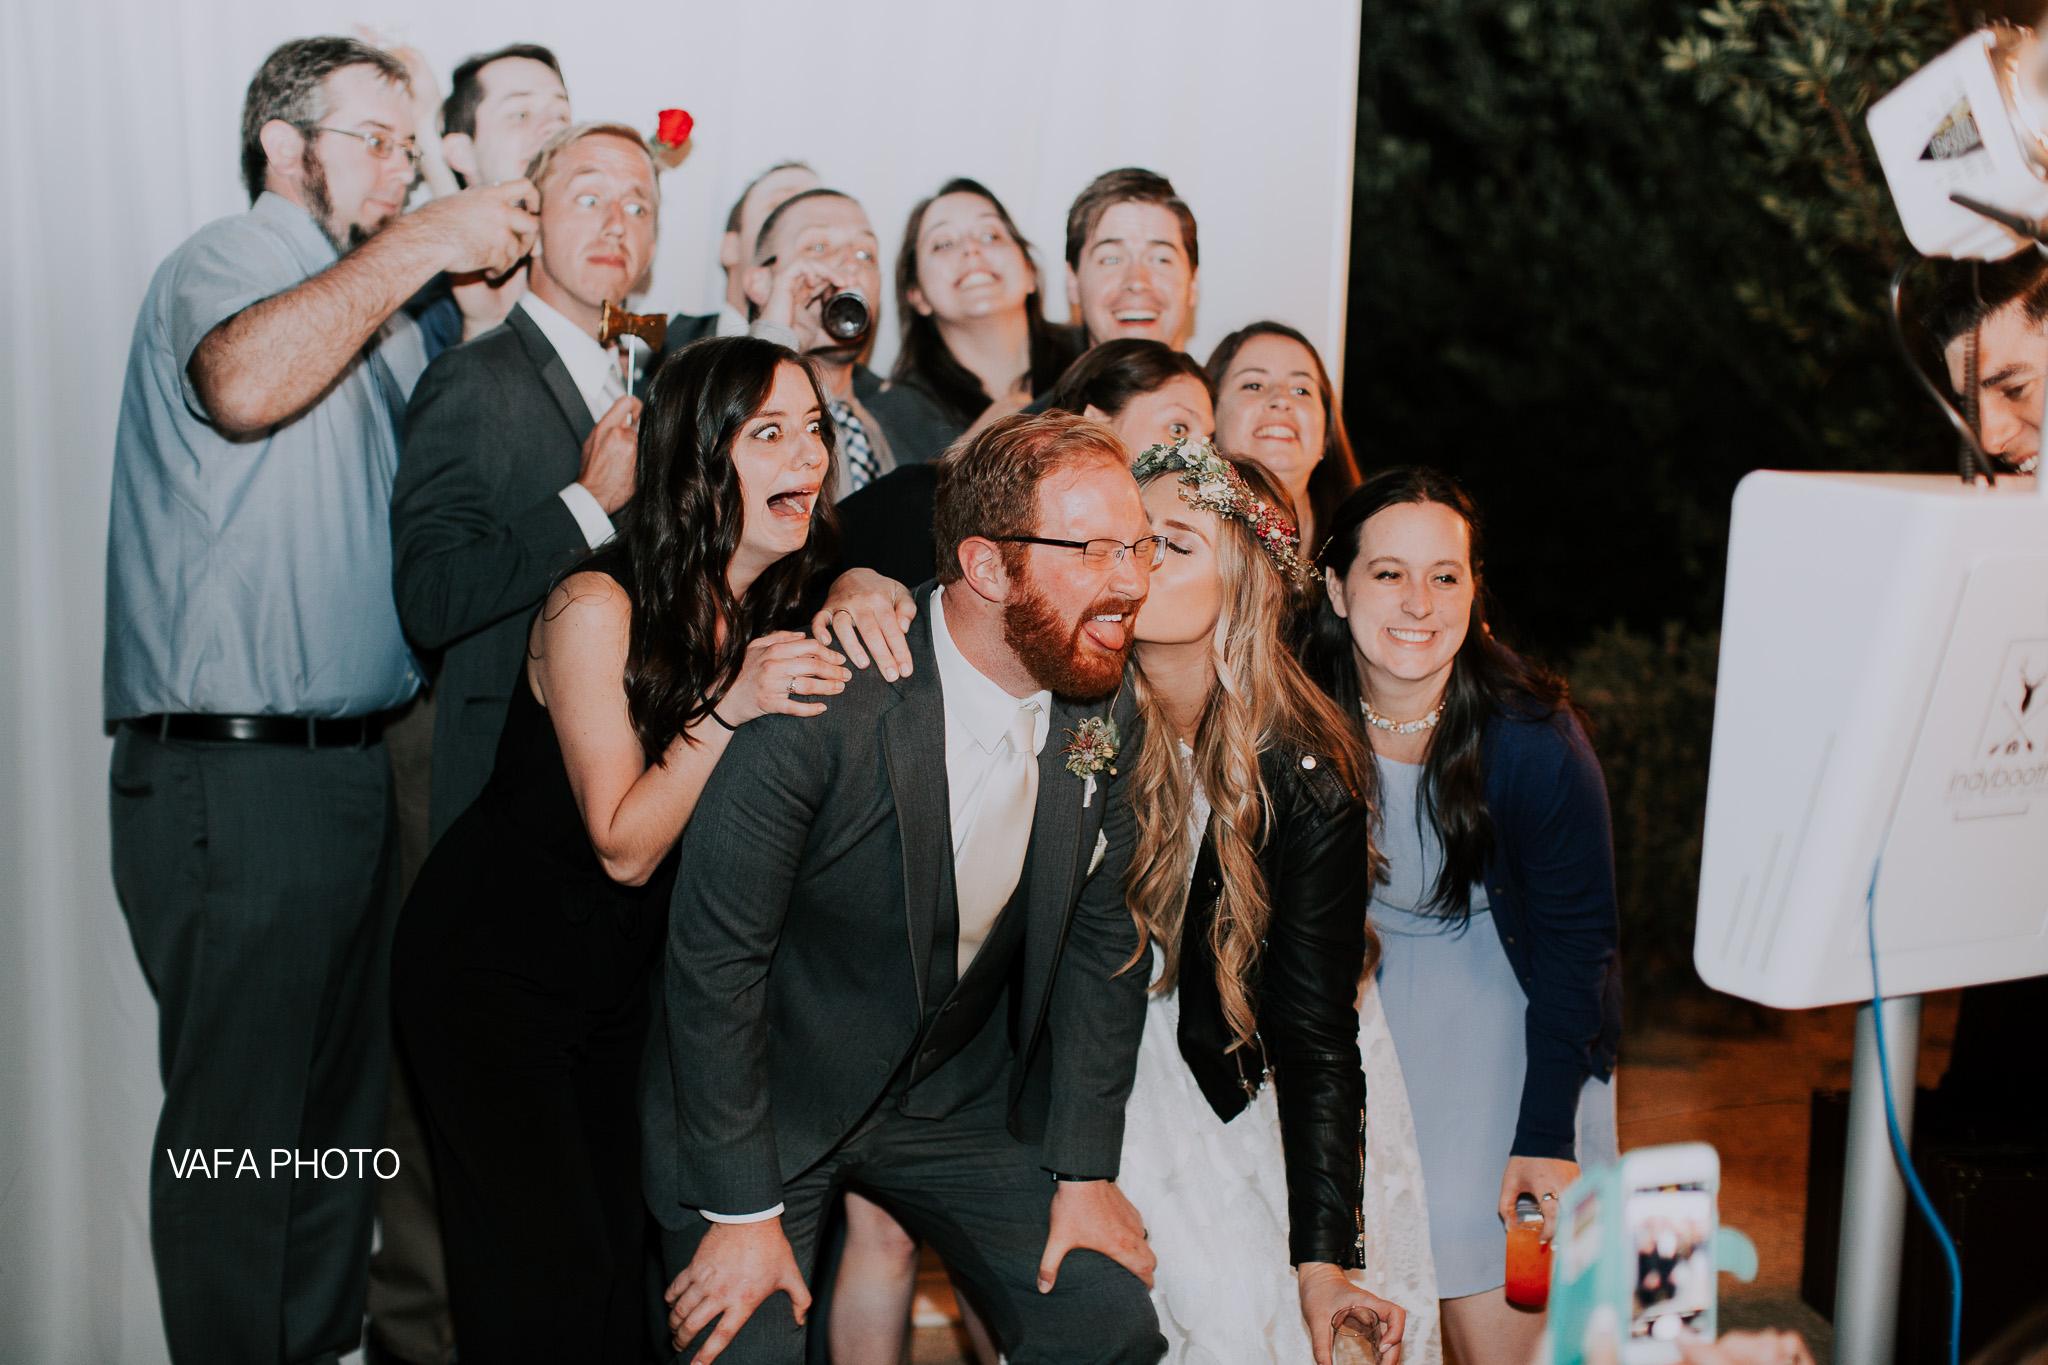 Leo-Carrillo-Ranch-Wedding-Lauren-Mike-Vafa-Photo-1077.jpg